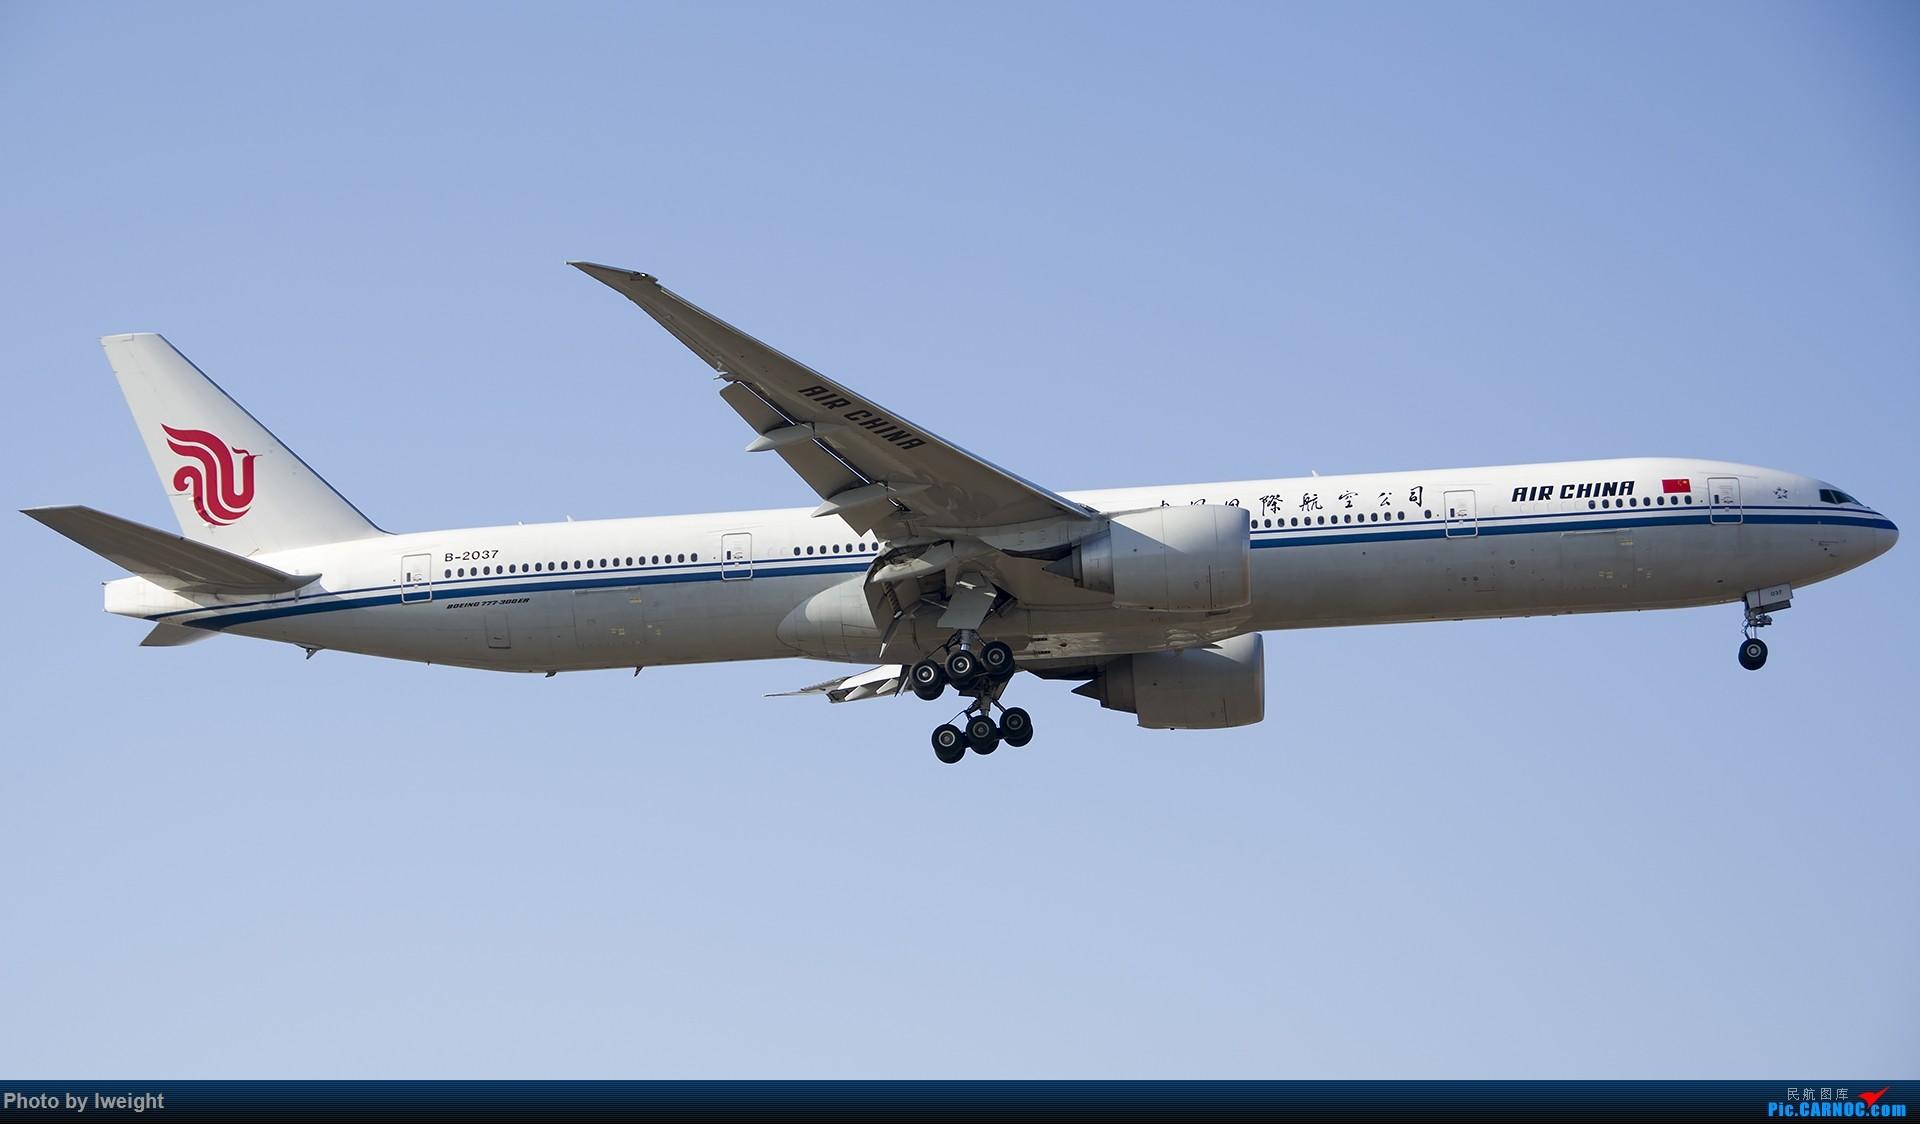 Re:[原创]庆祝升级777,发上今天在首都机场拍的所有飞机【2014-12-14】 BOEING 777-300ER B-2037 中国北京首都国际机场